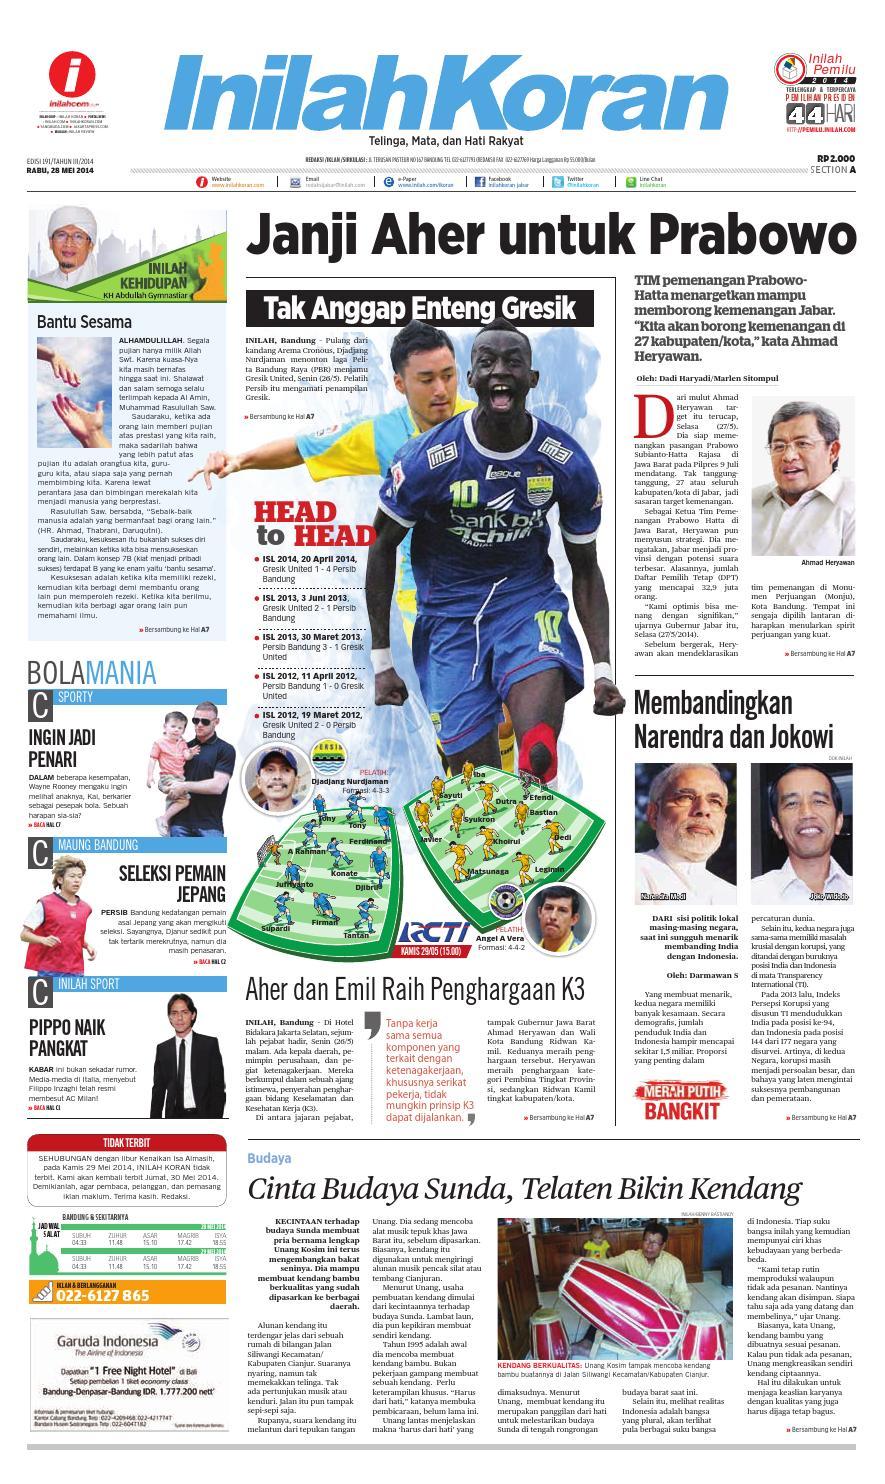 Wajib Menang Derby Bandung By Inilah Koran Issuu Produk Ukm Bumn Shifudo Bakso Ikan 500g Free Ongkir Depok Ampamp Jakarta Janji Aher Untuk Prabowo